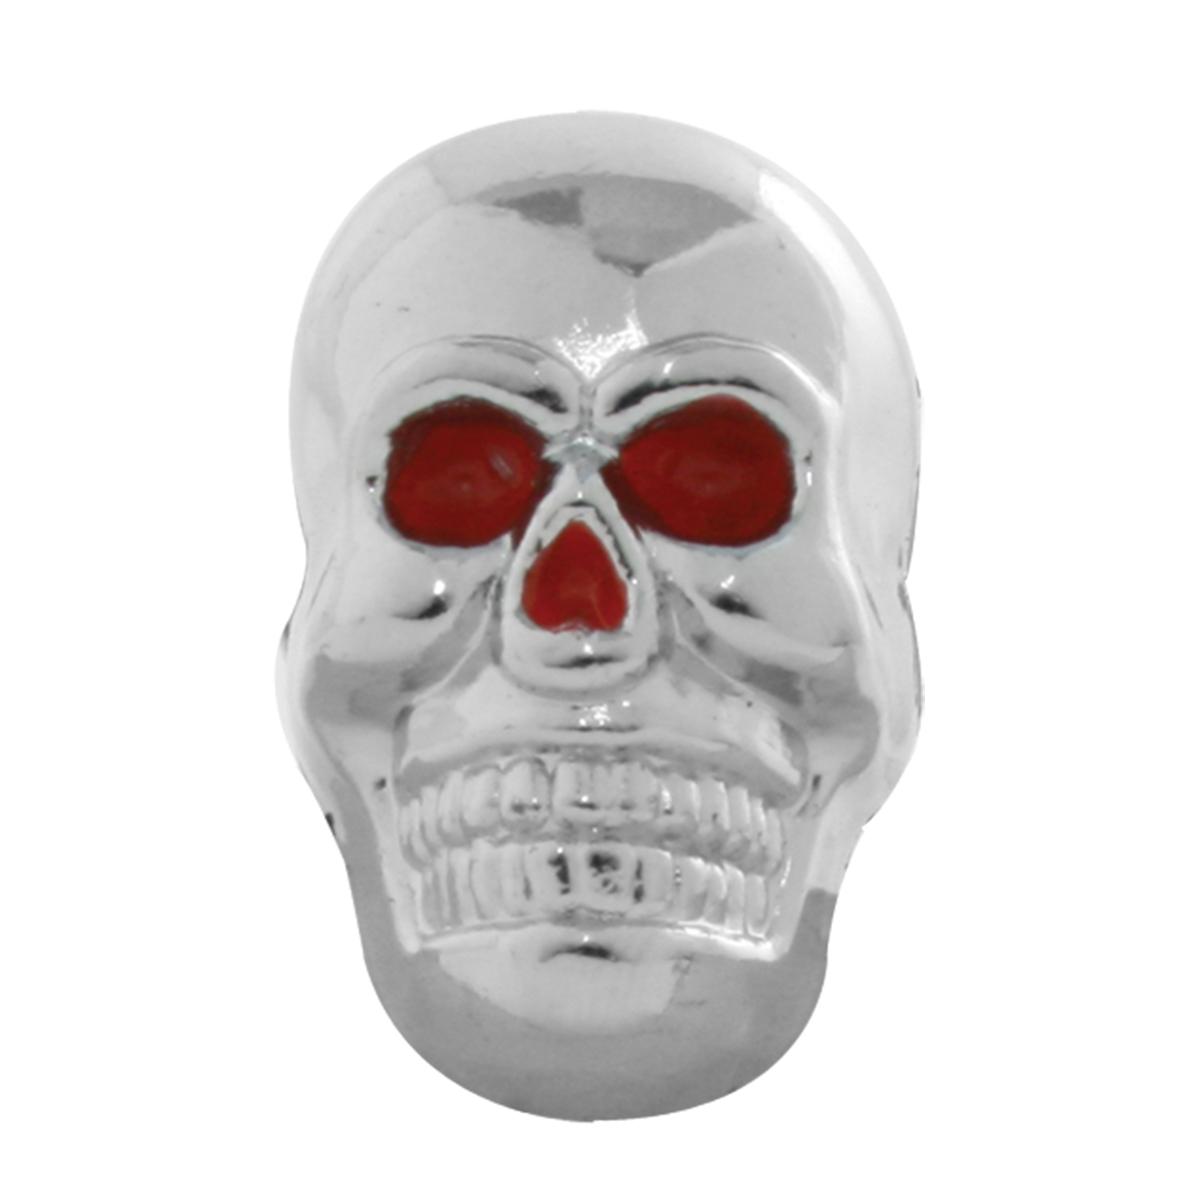 93750 Red Eye Skull Dash Knobs